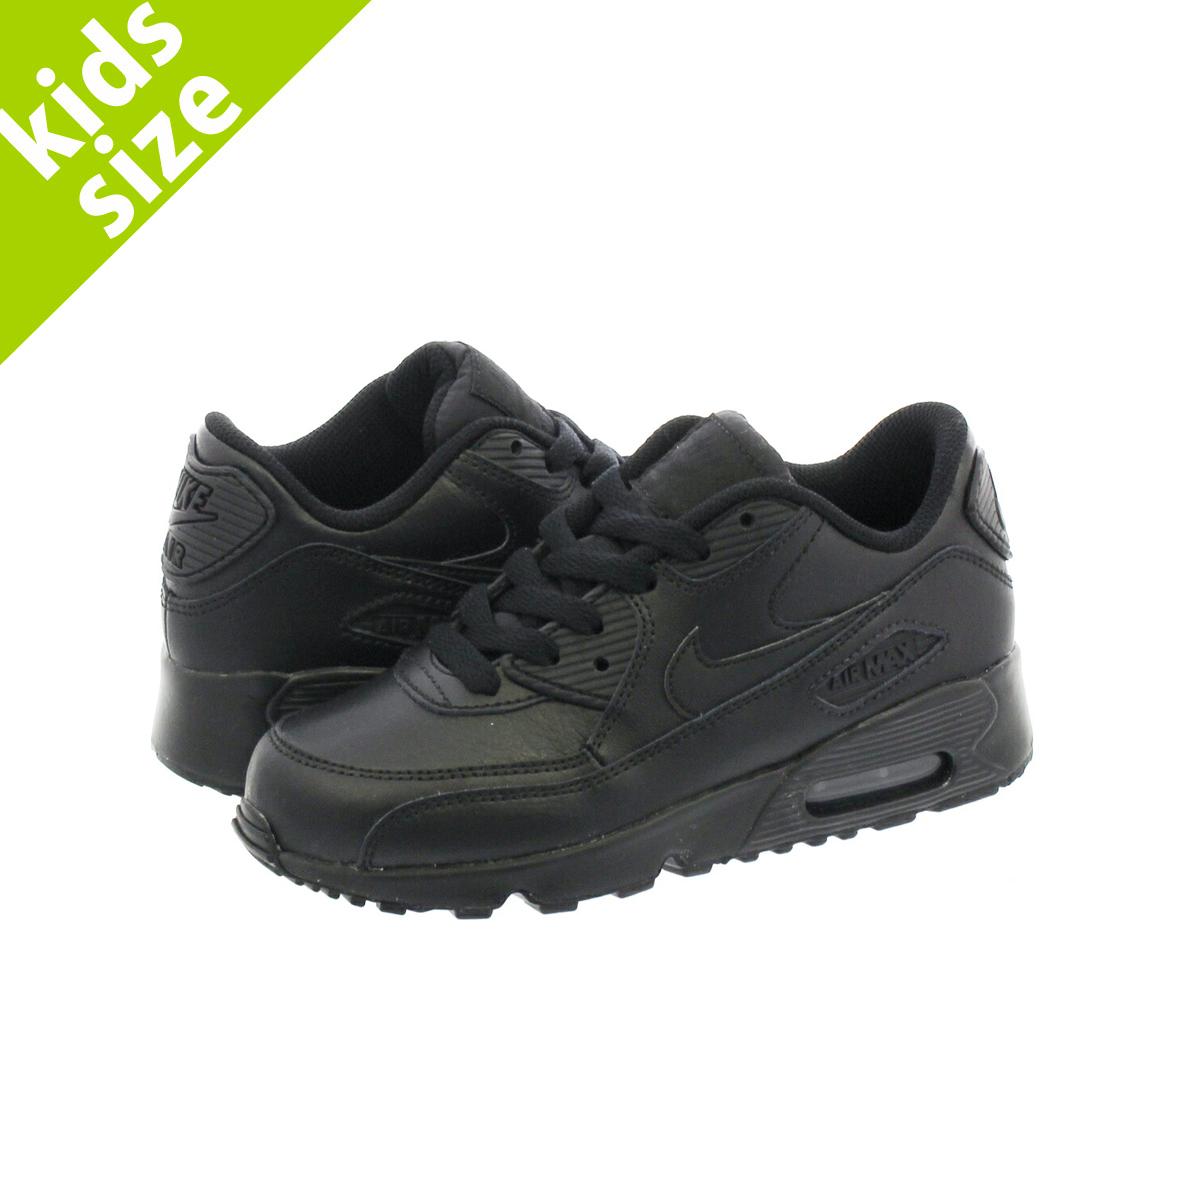 0cc1ed4bb3f3b NIKE AIR MAX 90 LTR PS Kie Ney AMAX 90 leather PS BLACK/BLACK 833,414-001